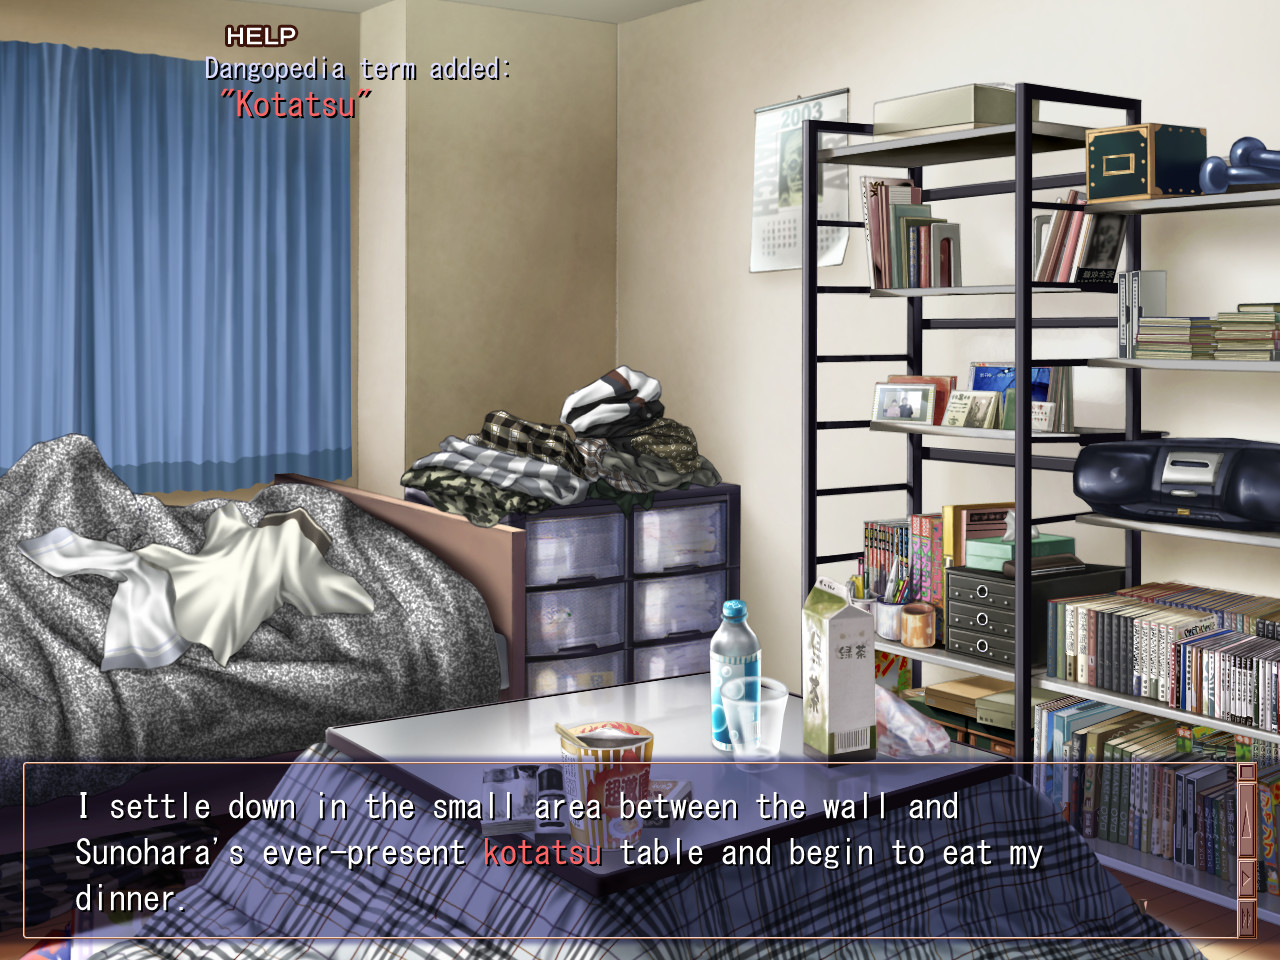 Clannad dating sim download